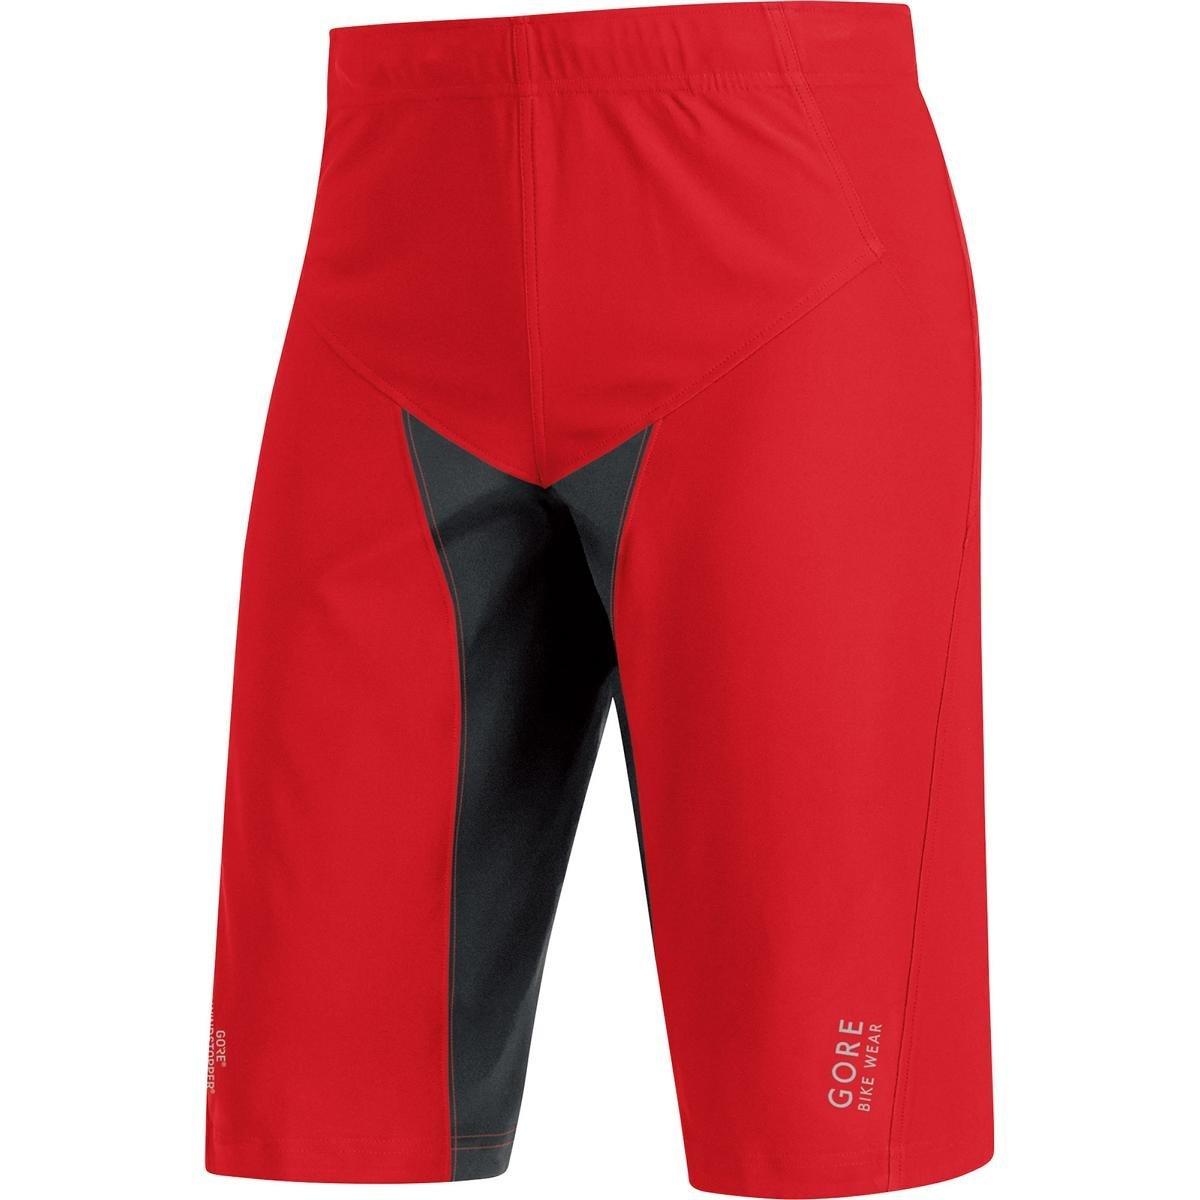 Gore Bike WEAR Men's Mountainbike Over-Shorts, Short, Gore Windstopper, ALP-X PRO WS SO Shorts, Size L, Red/Black, TWPALP